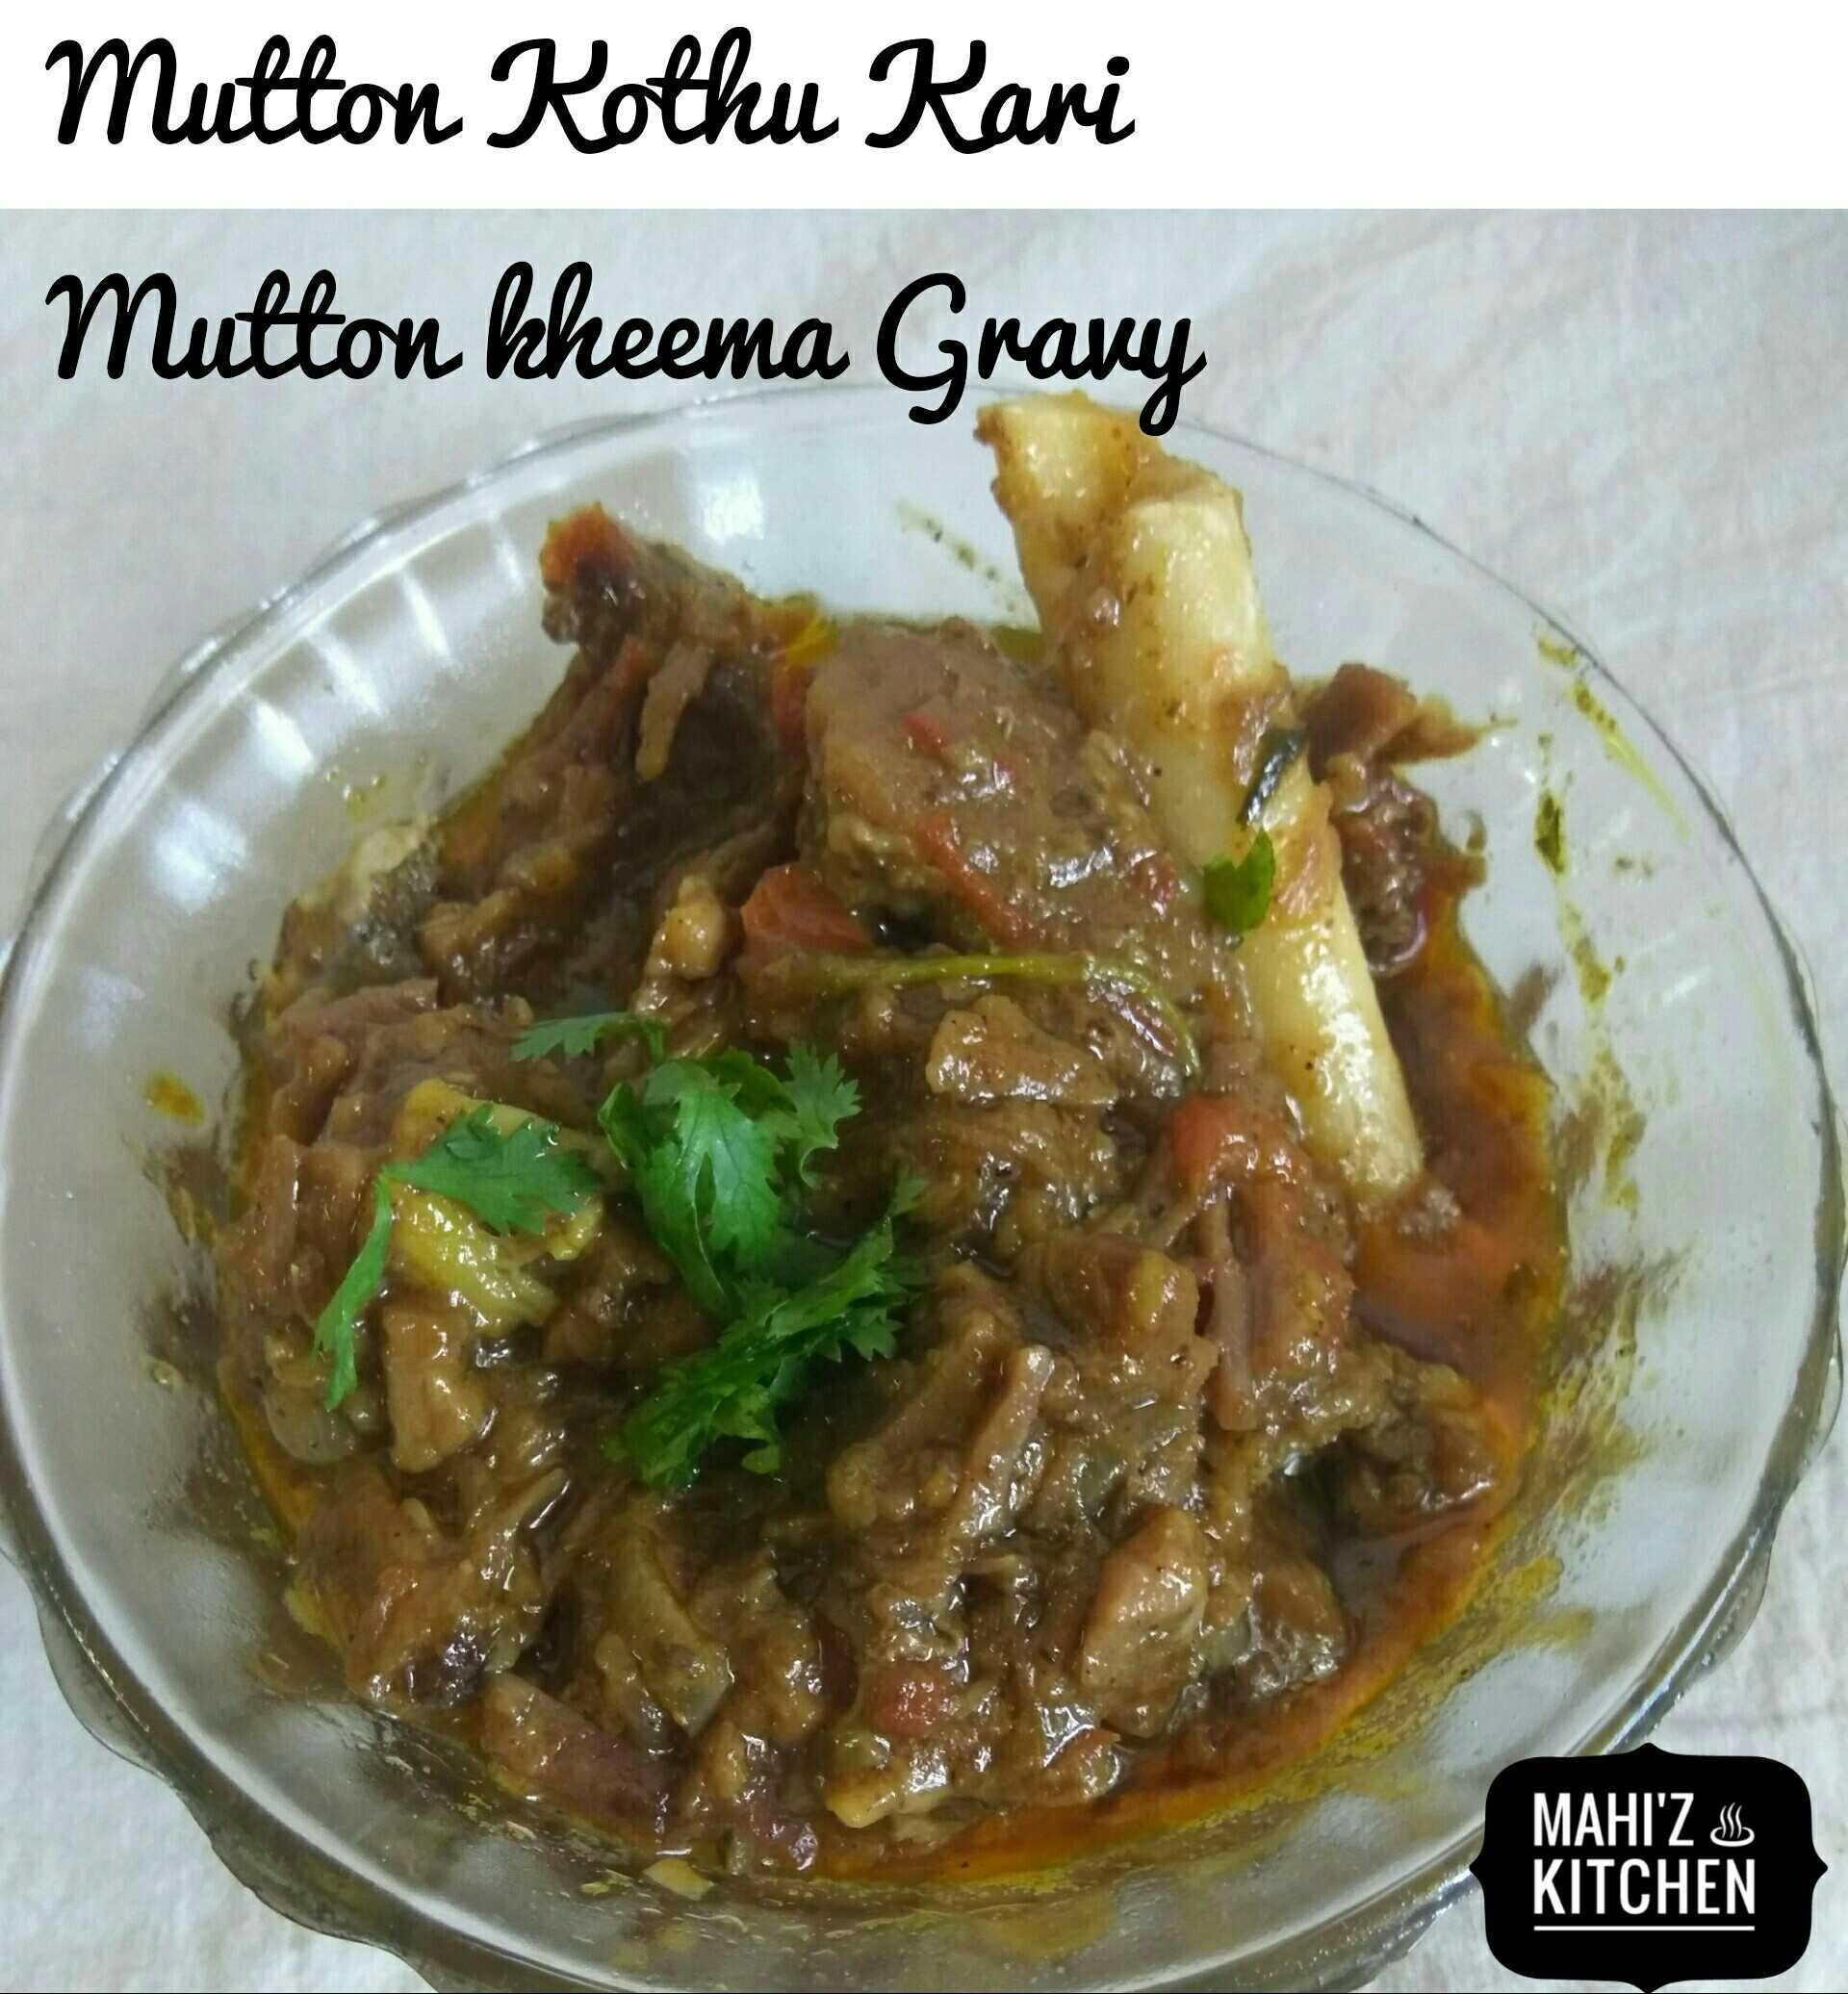 Mutton Kheema Gravy / Mutton Kothu Kari